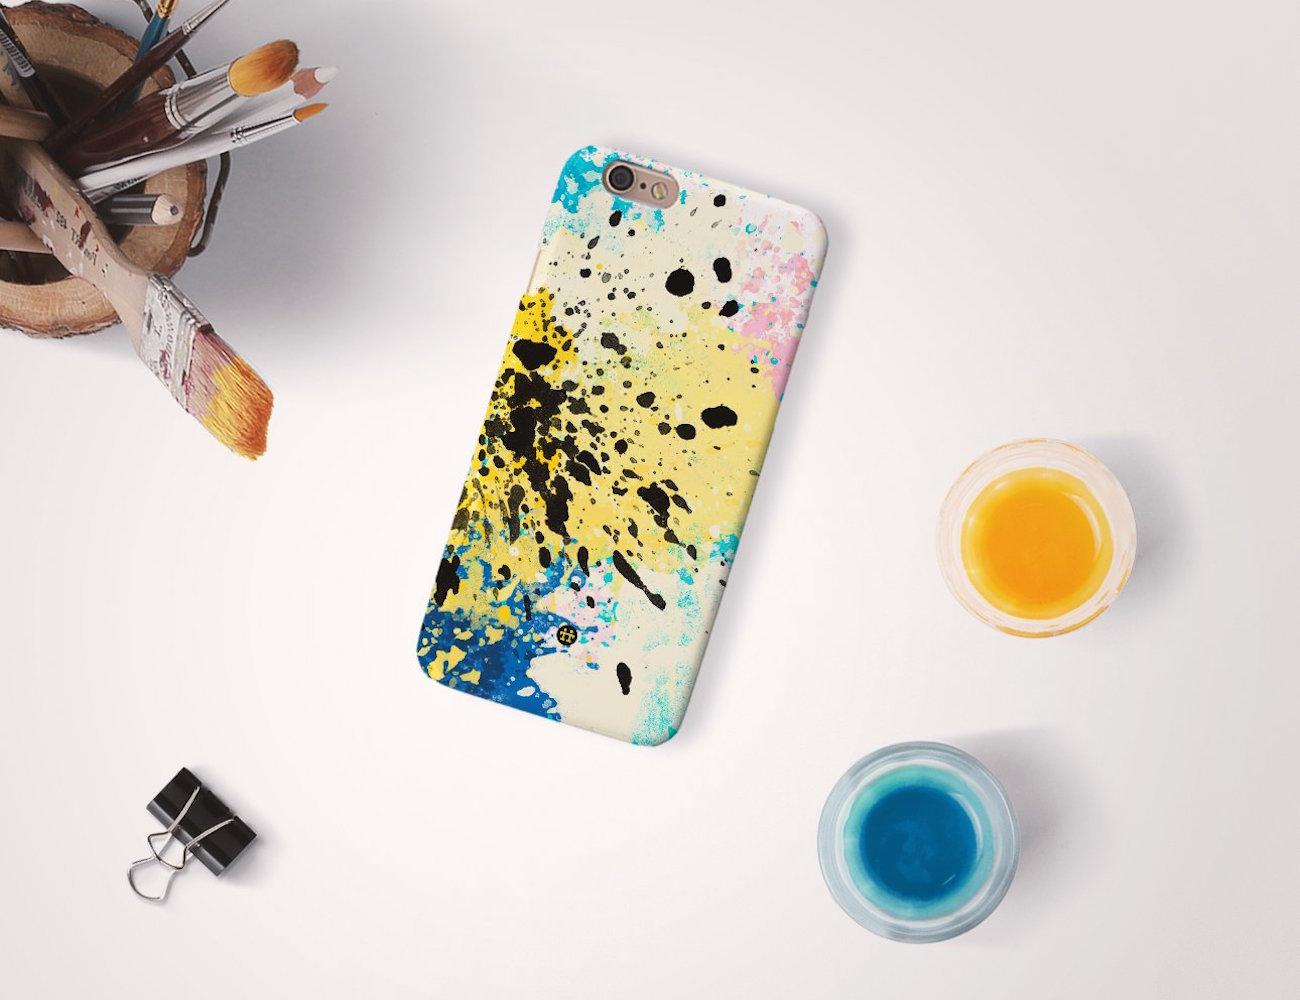 cmyk splash art phone case by madotta gadget flow